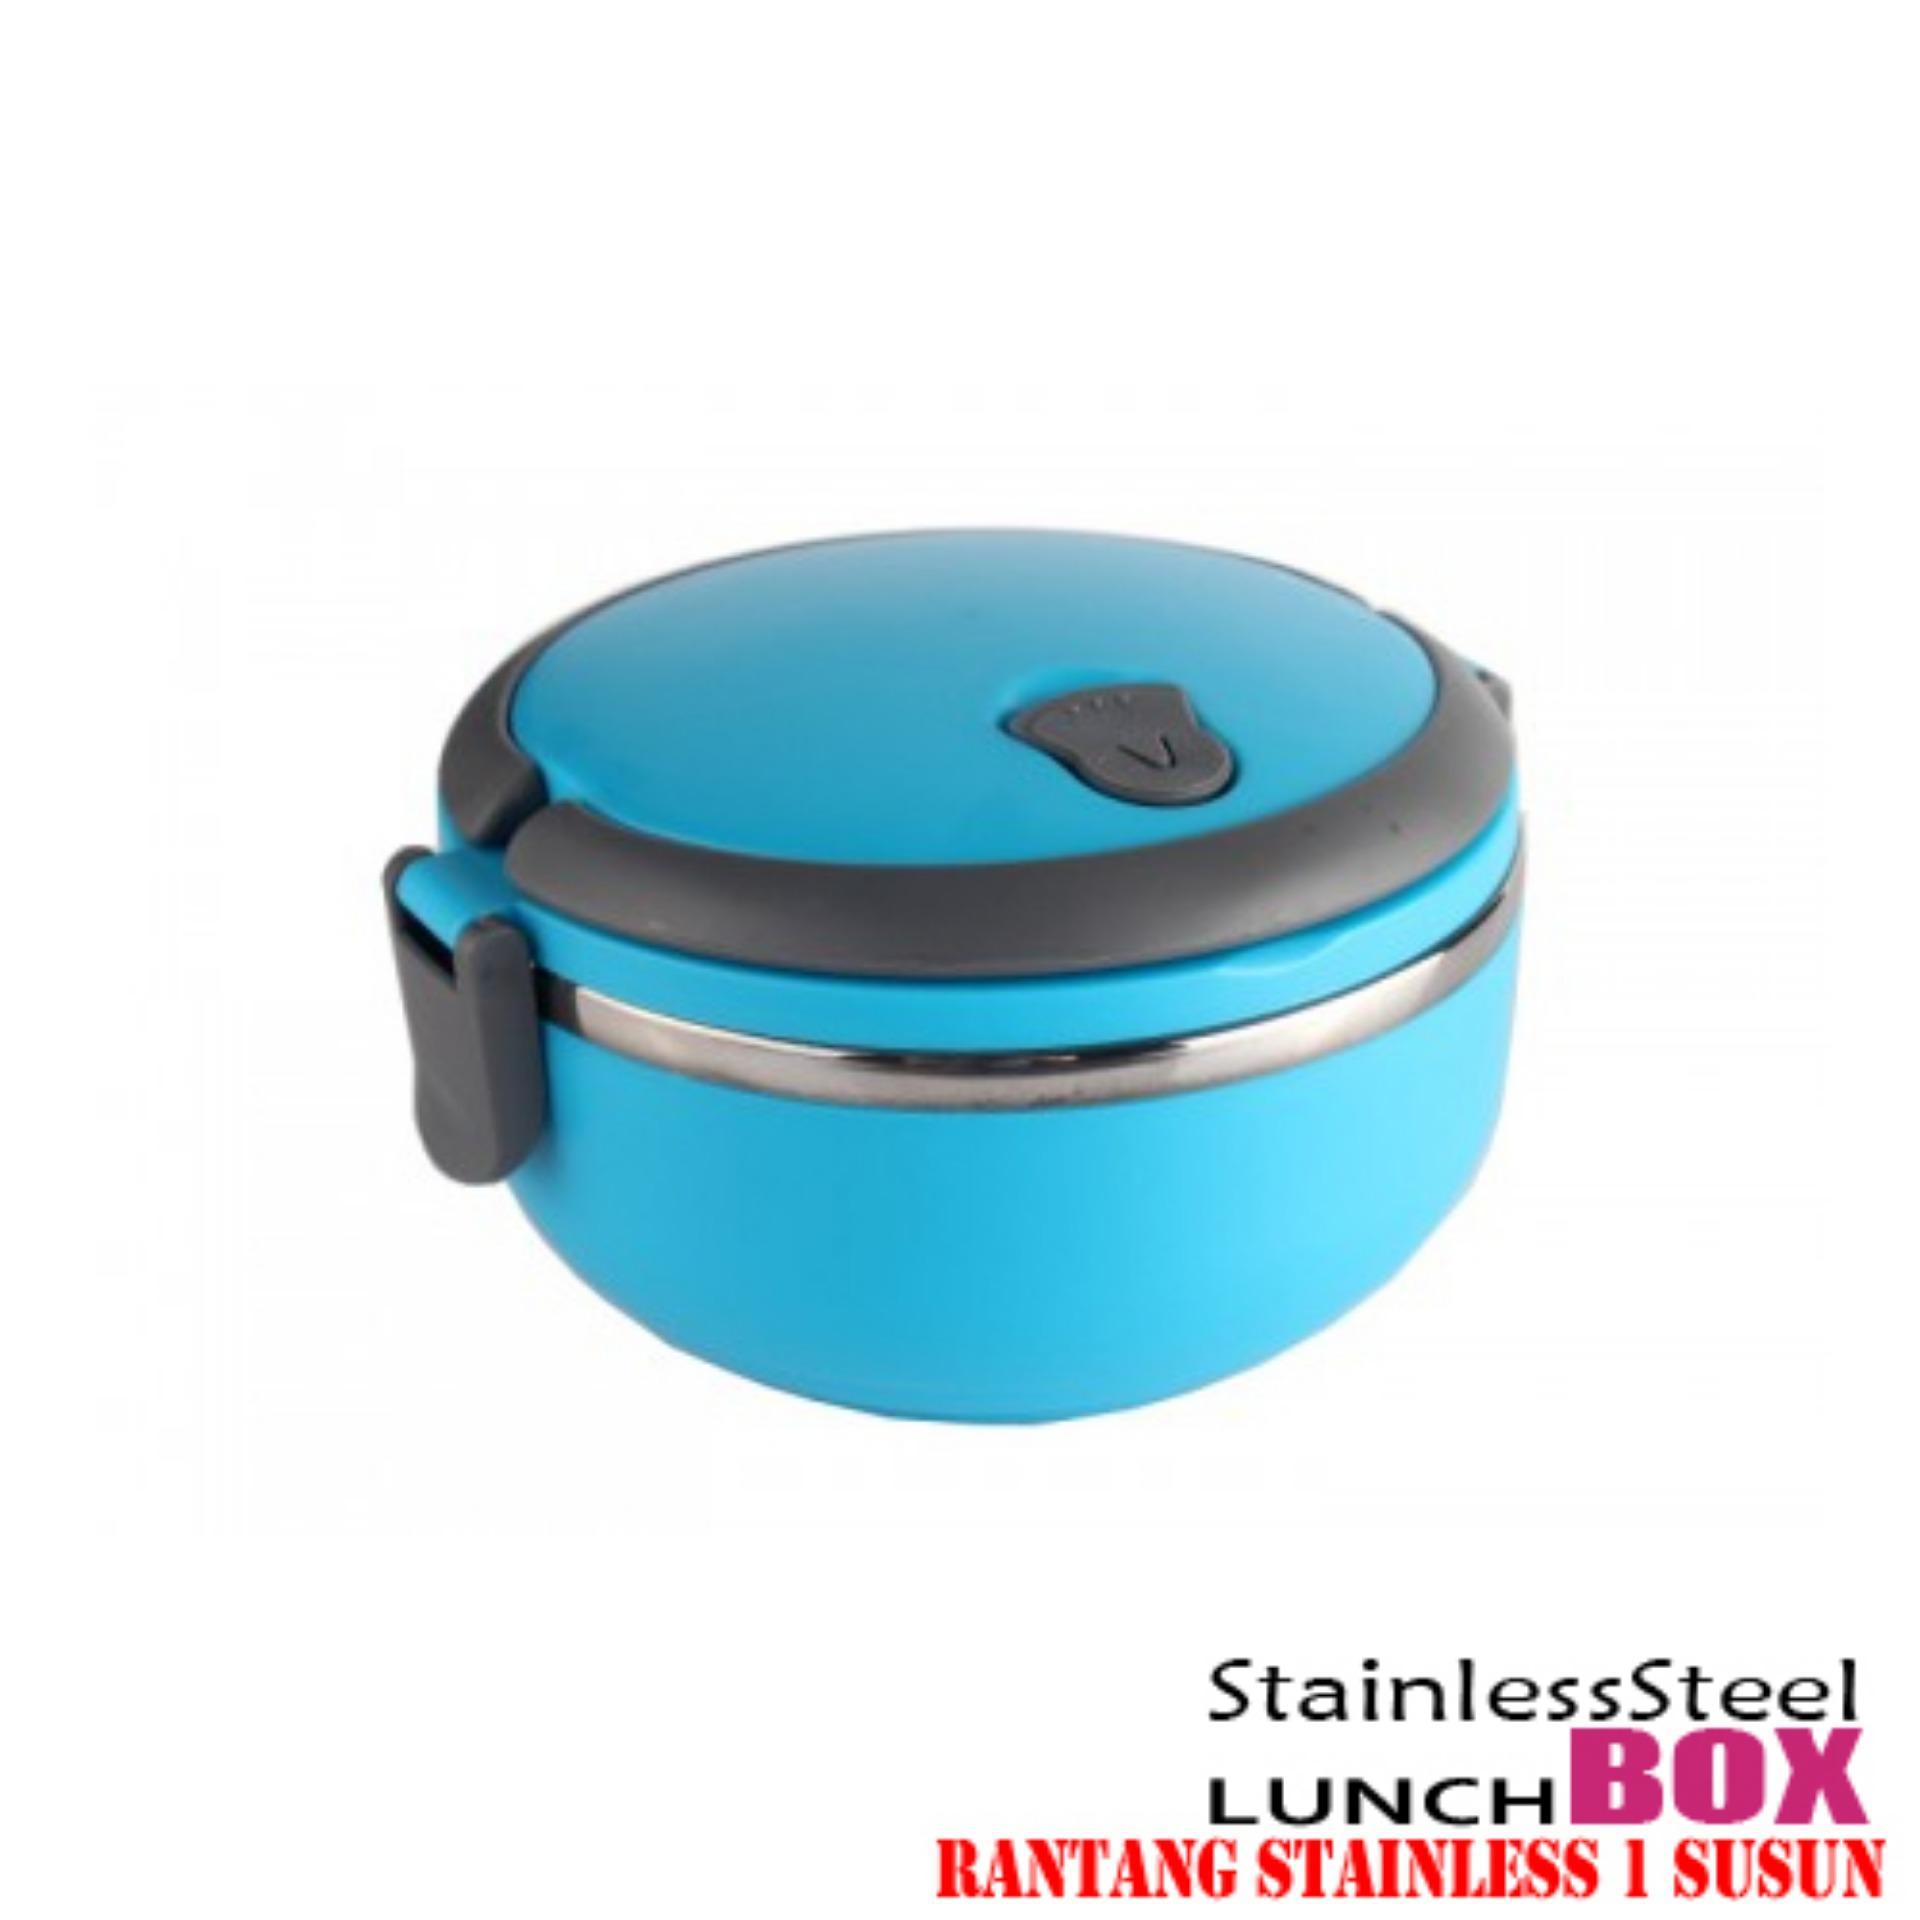 555 Lunch box rantang stainless steel 1 susun - biru